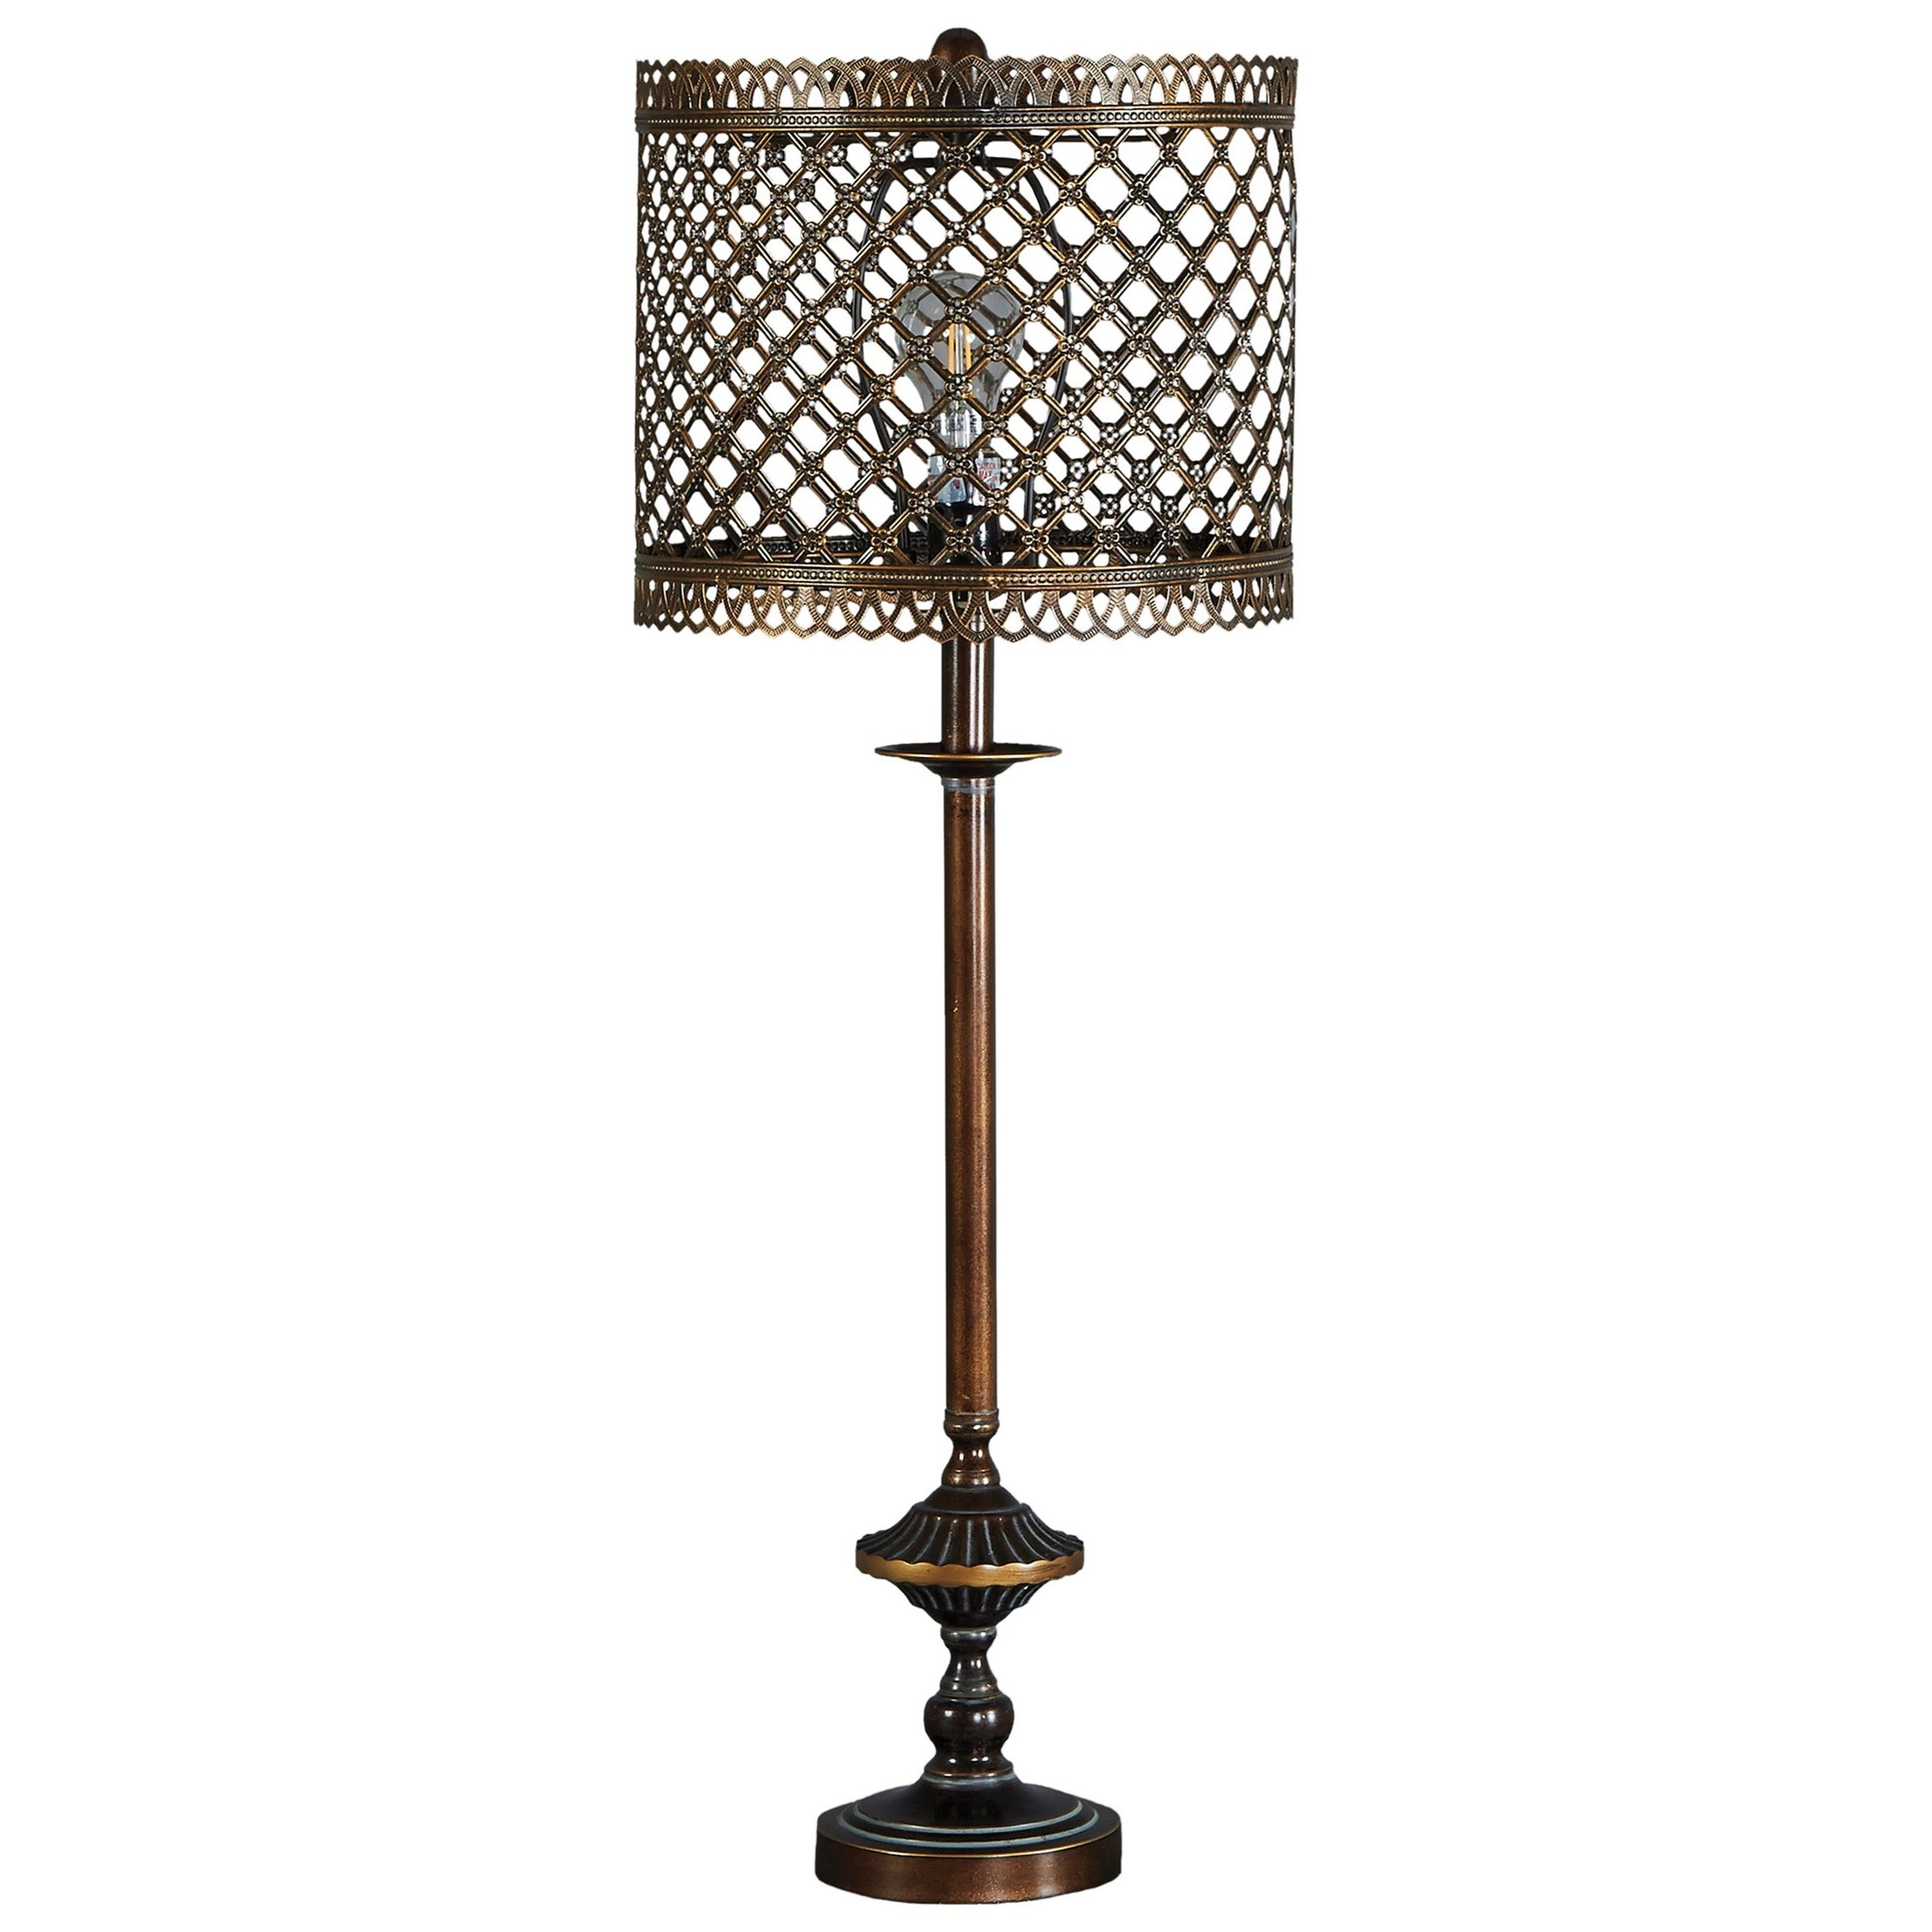 Rodolf Antique Brass Finish Metal Table Lamp